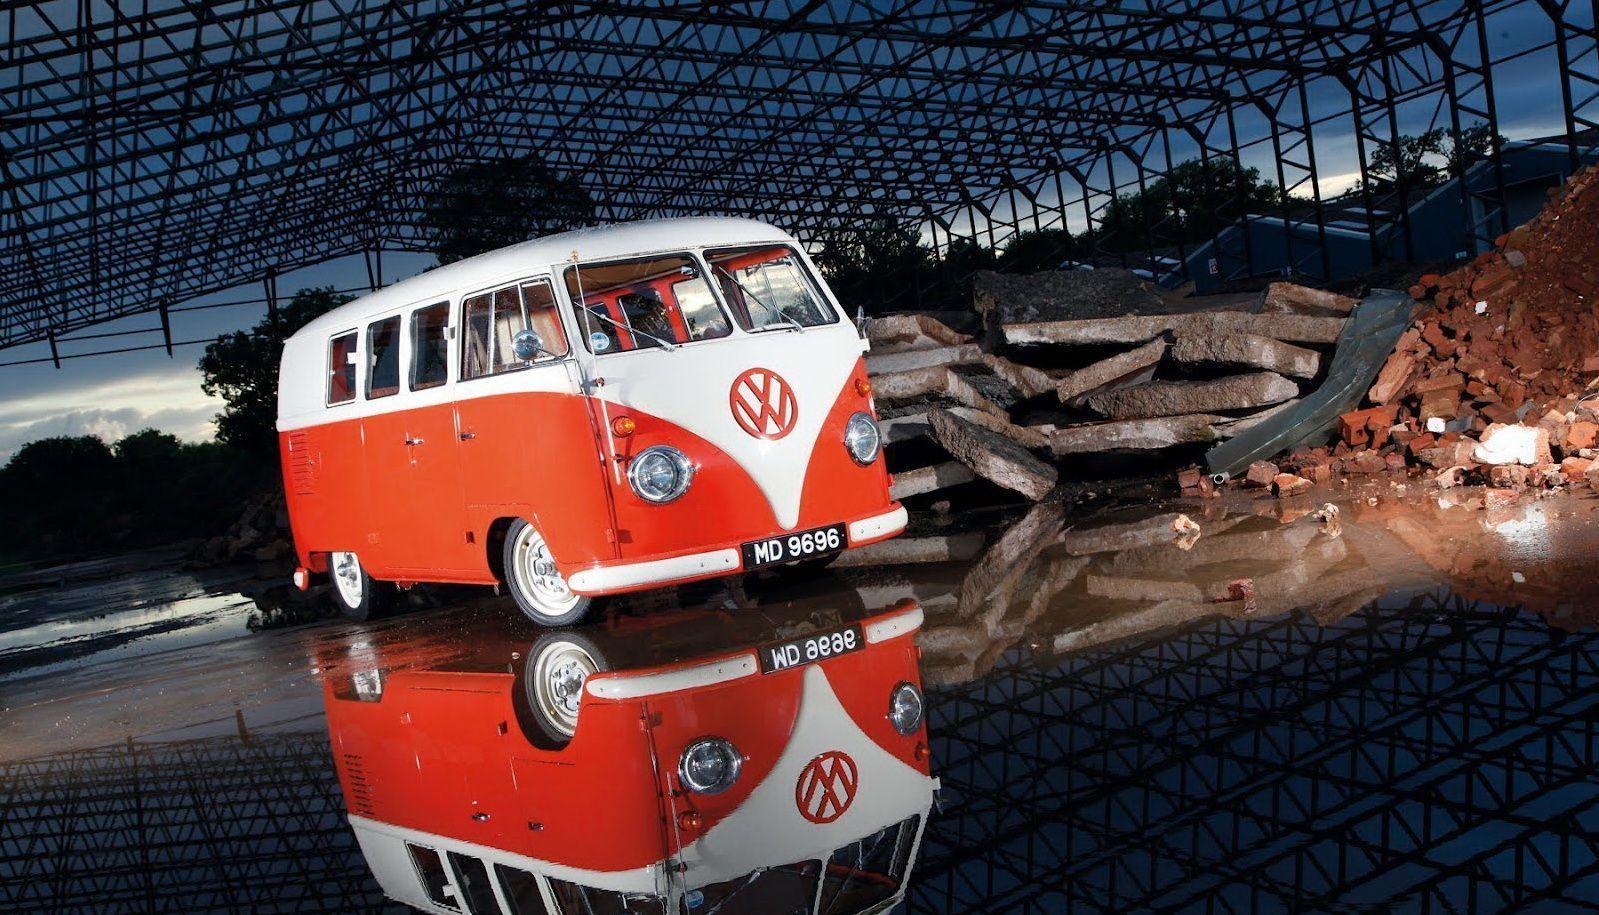 Iphone Muscle Car Wallpapers Volkswagen Bus Wallpapers Wallpaper Cave